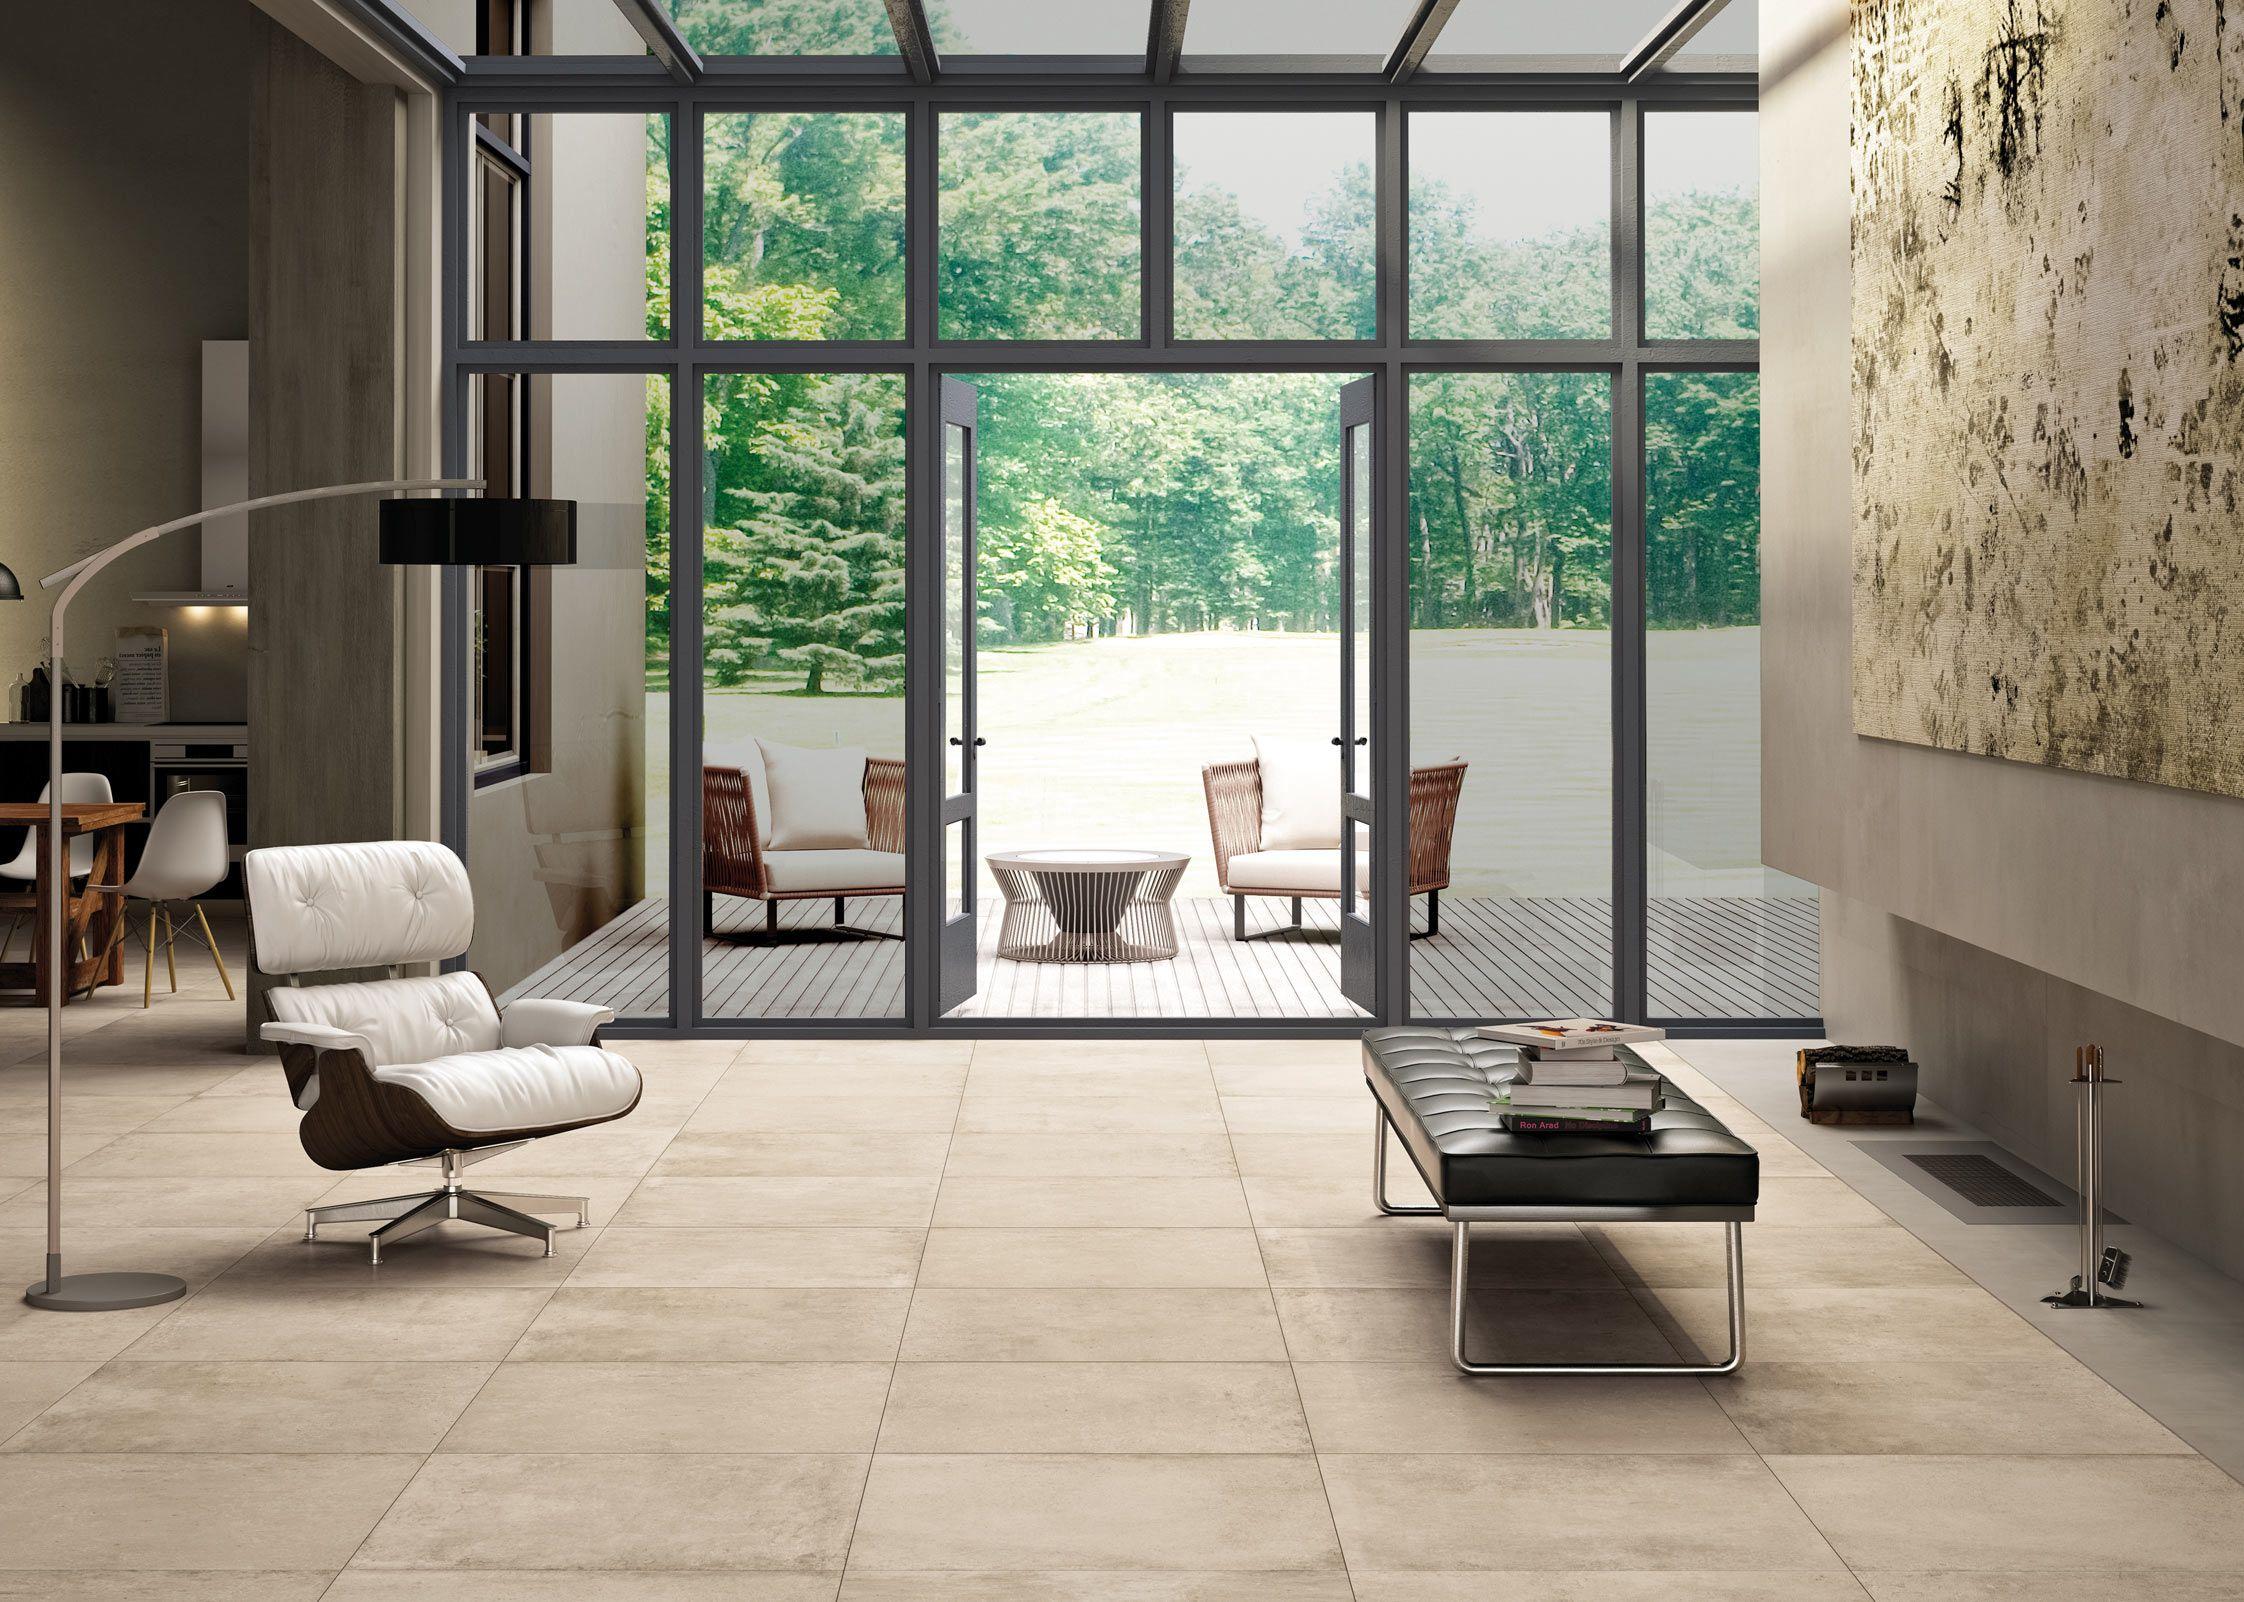 Concrete floor leading to a deck Floor design, Stone